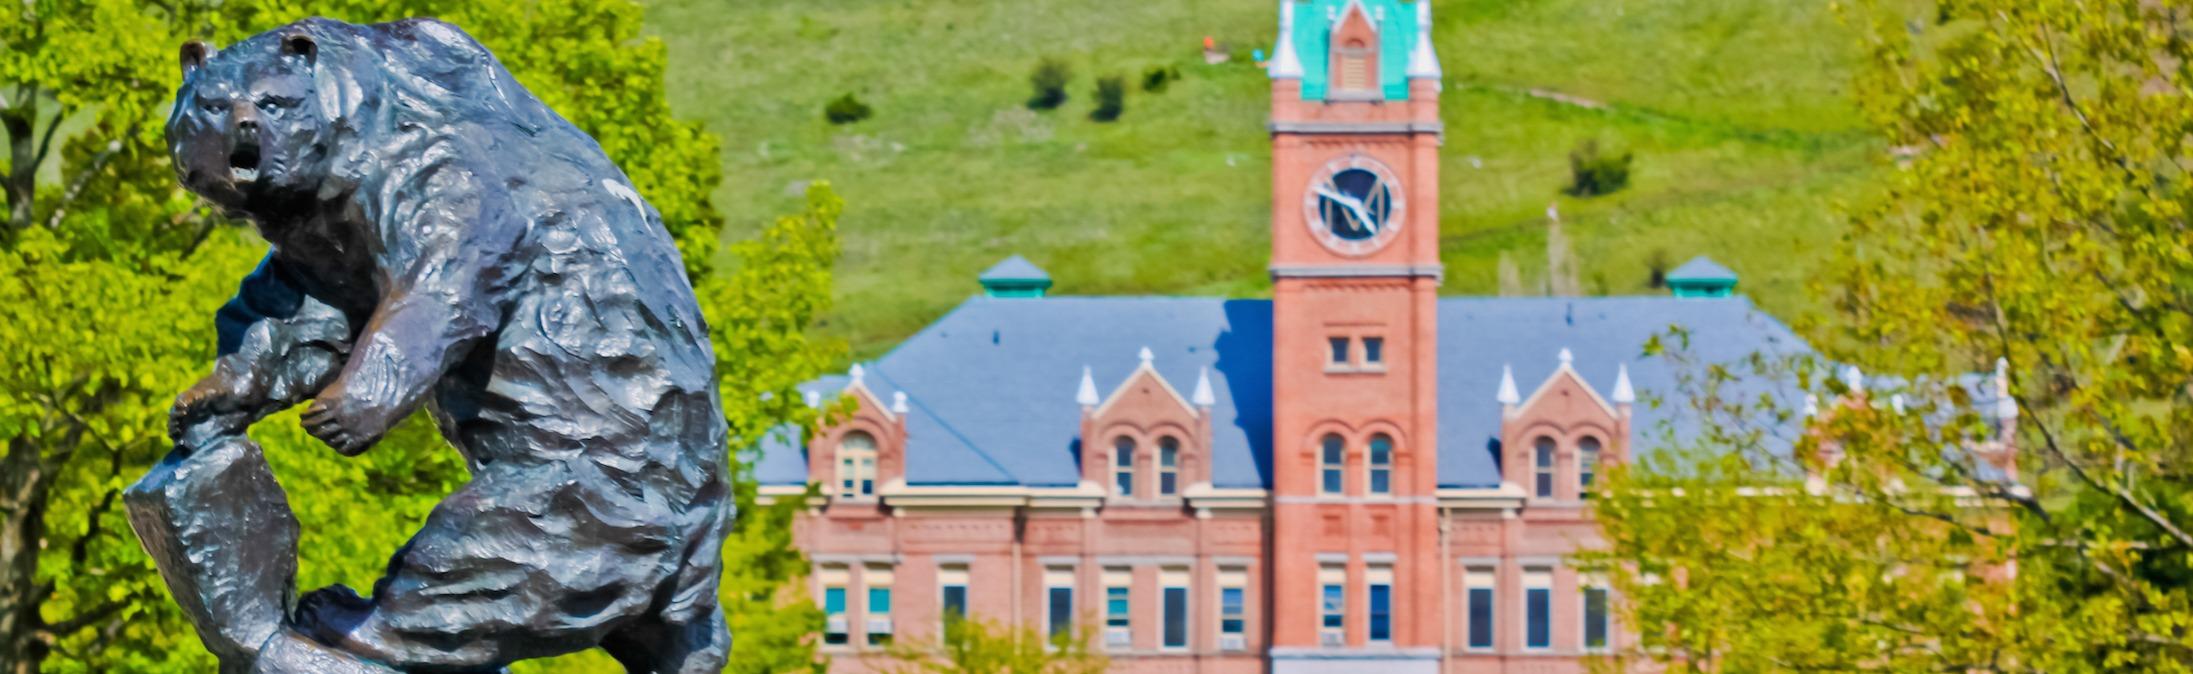 Top 20 College Towns:  #9 - Missoula, Montana